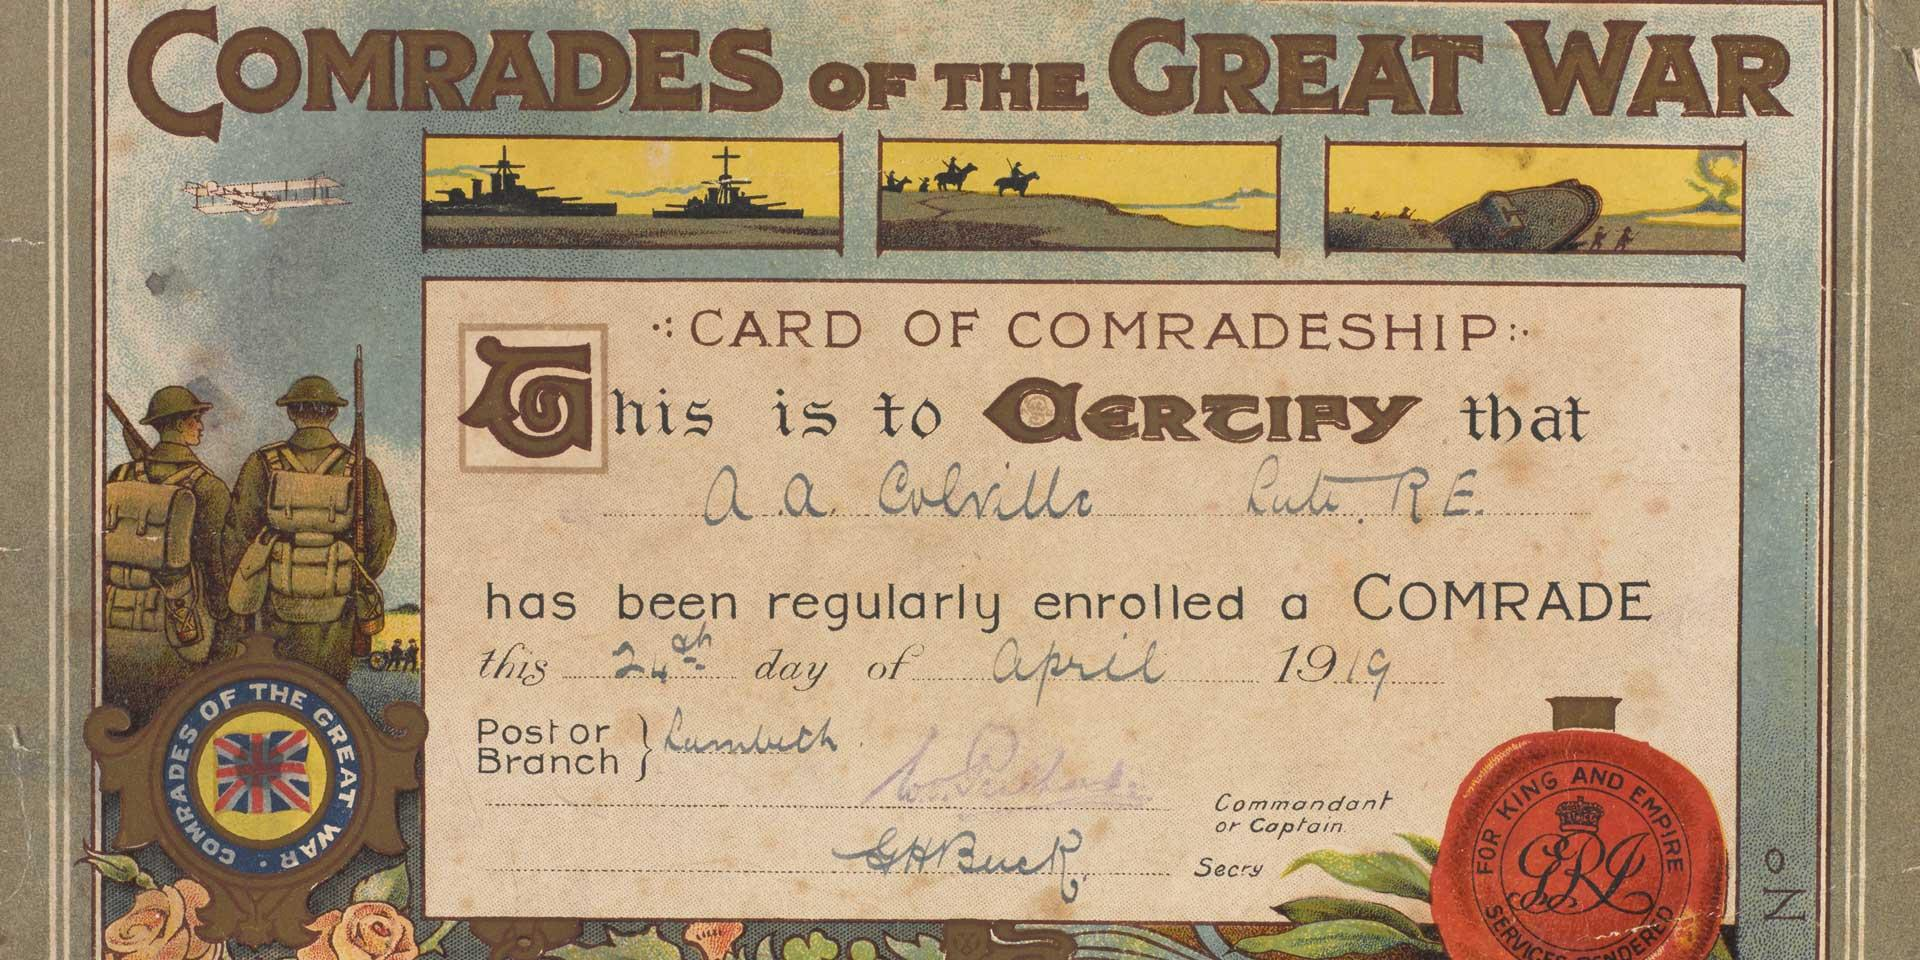 Comrades of the Great War membership enrolment card, 24 April 1919